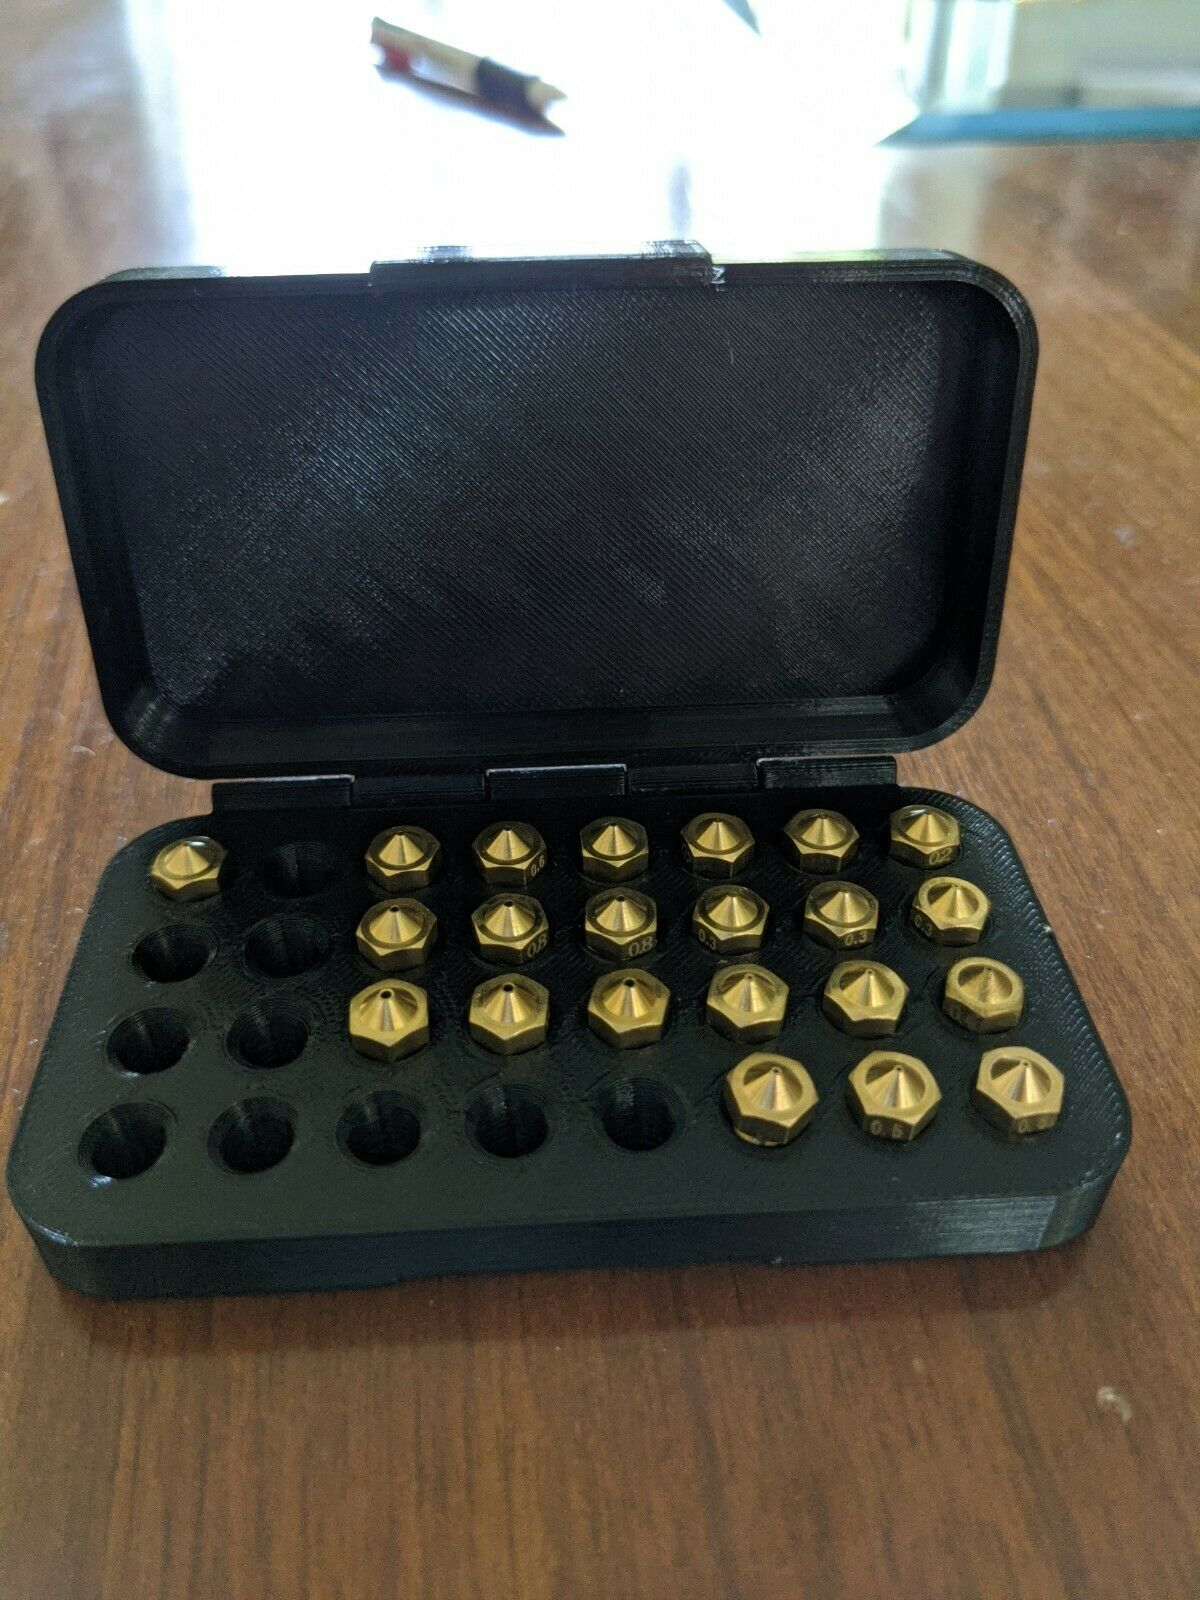 [3DMakerWorld] E3D Brass V6 Nozzle - 1.75mm